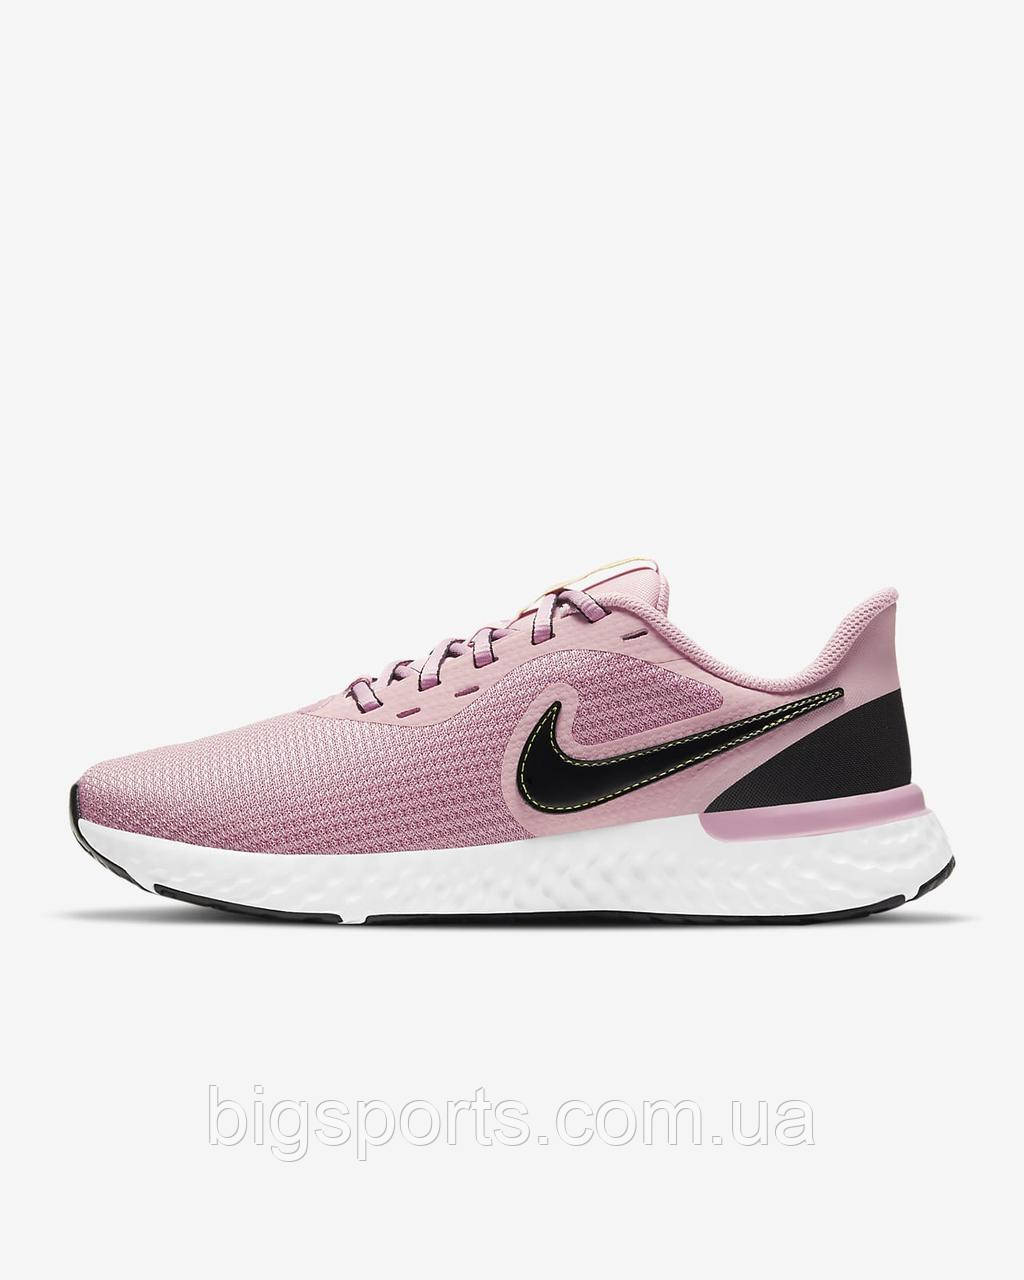 Кросівки дружин. Nike Air Max 90 Mesh GS (арт. 833418-409)